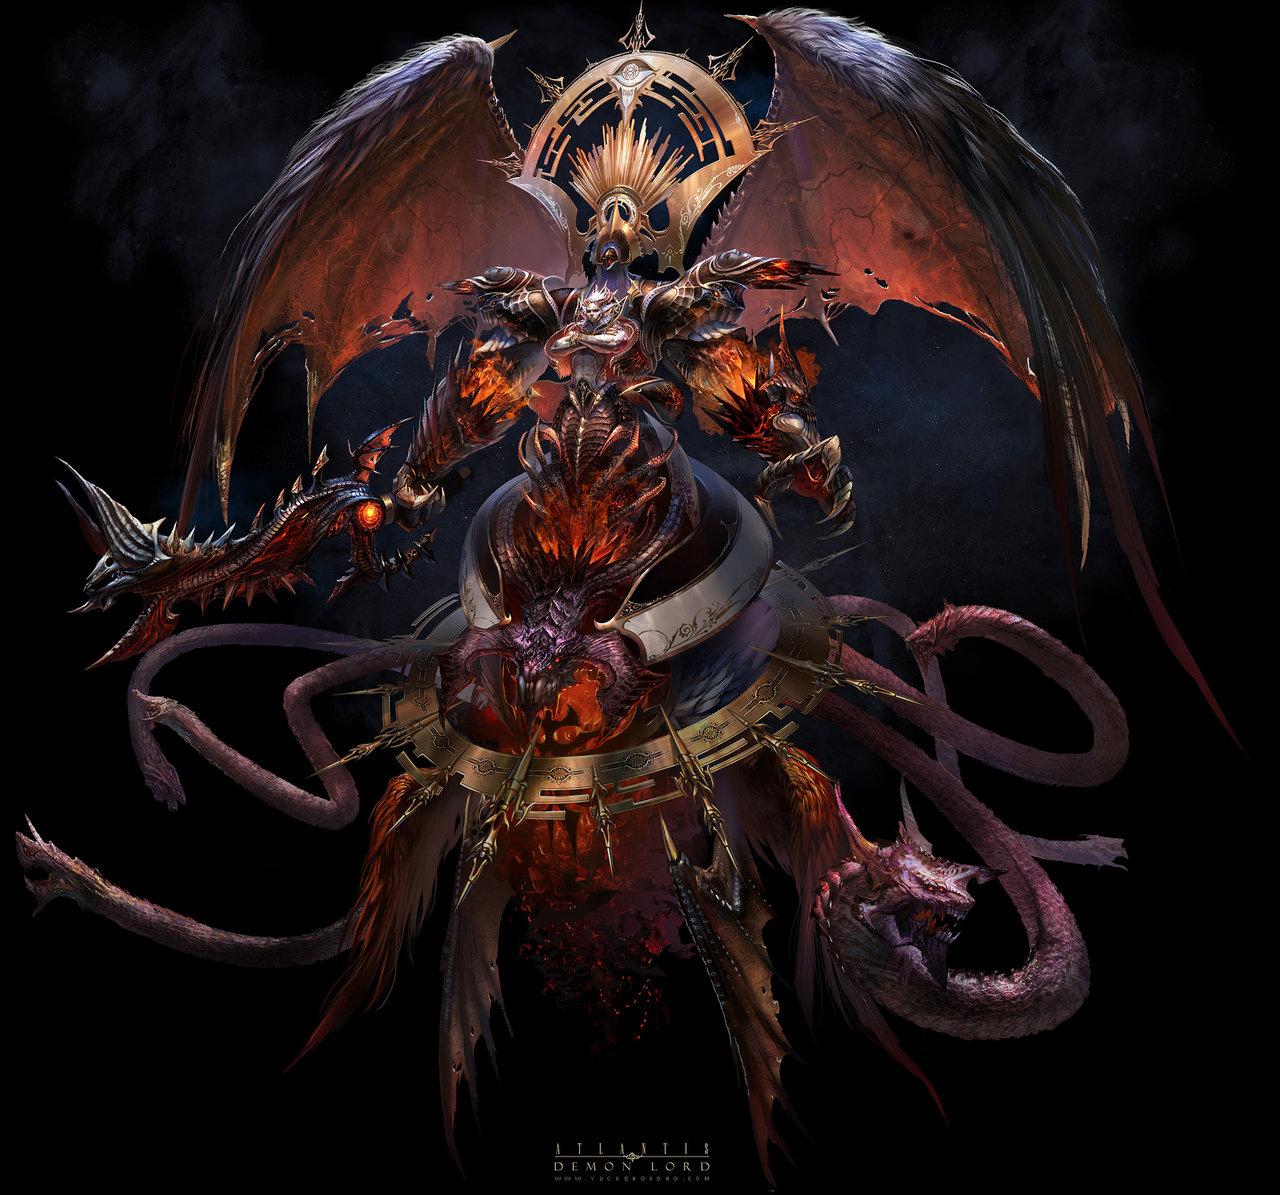 Drawn demon demon lord @deviantART yuchenghong com Demon @deviantART